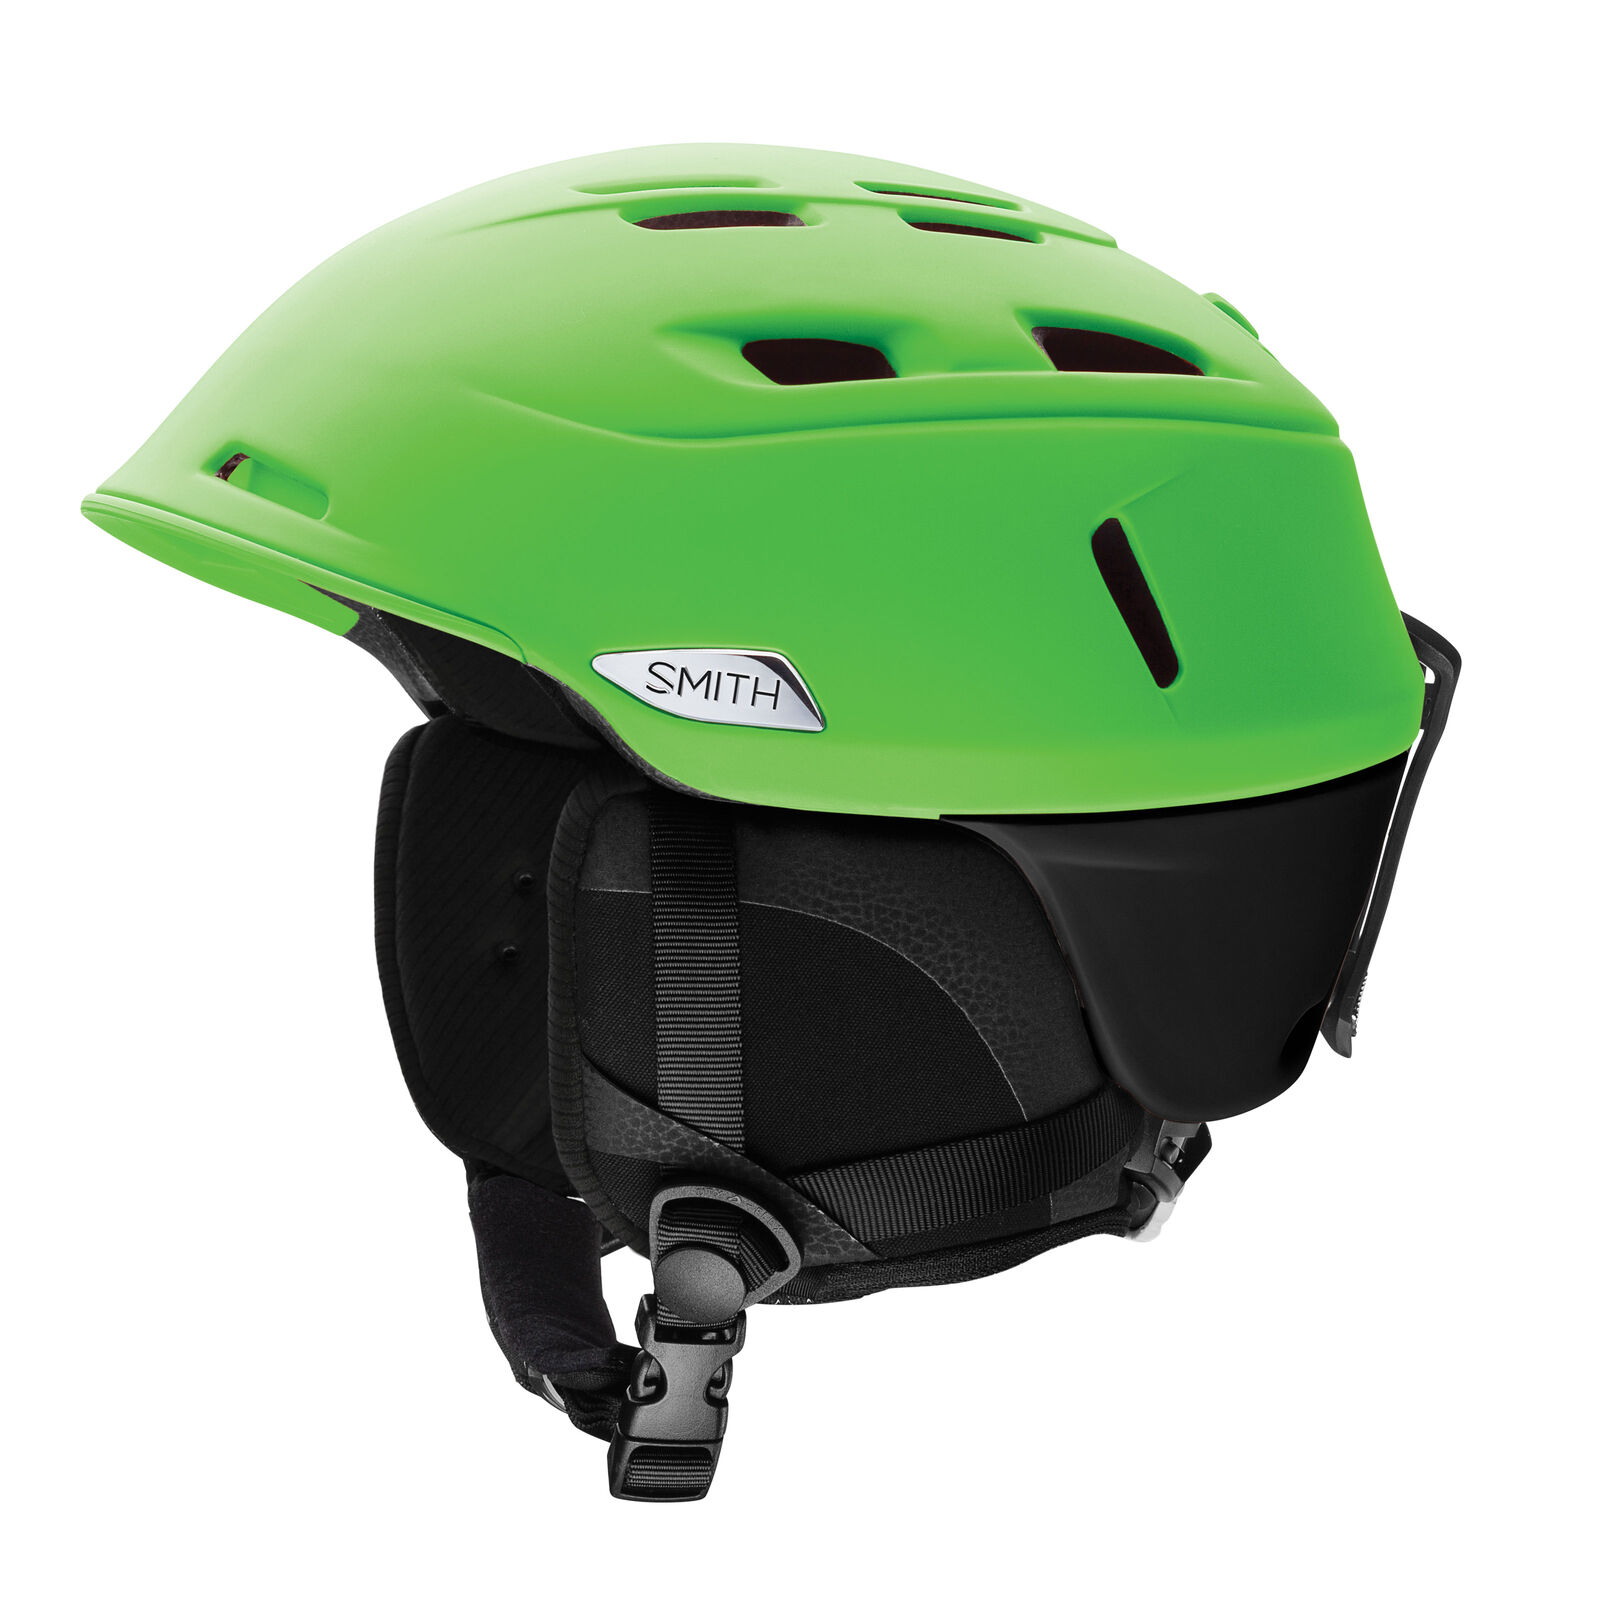 Smith Ski Snowboard Helmet Camber Light Grün Lightweight Plain All